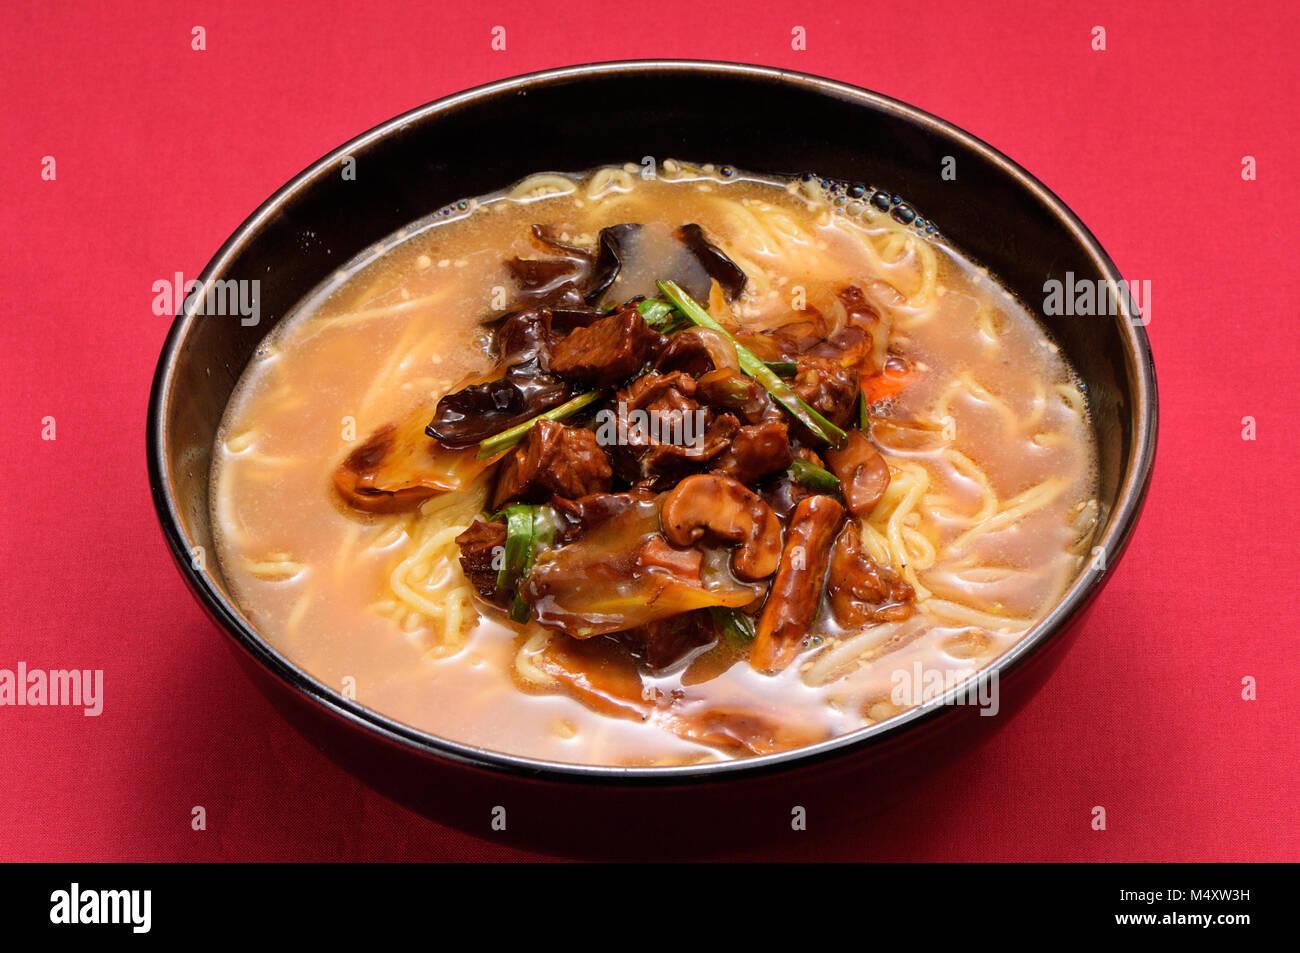 Dandan noodles with Jew's ear - Stock Image